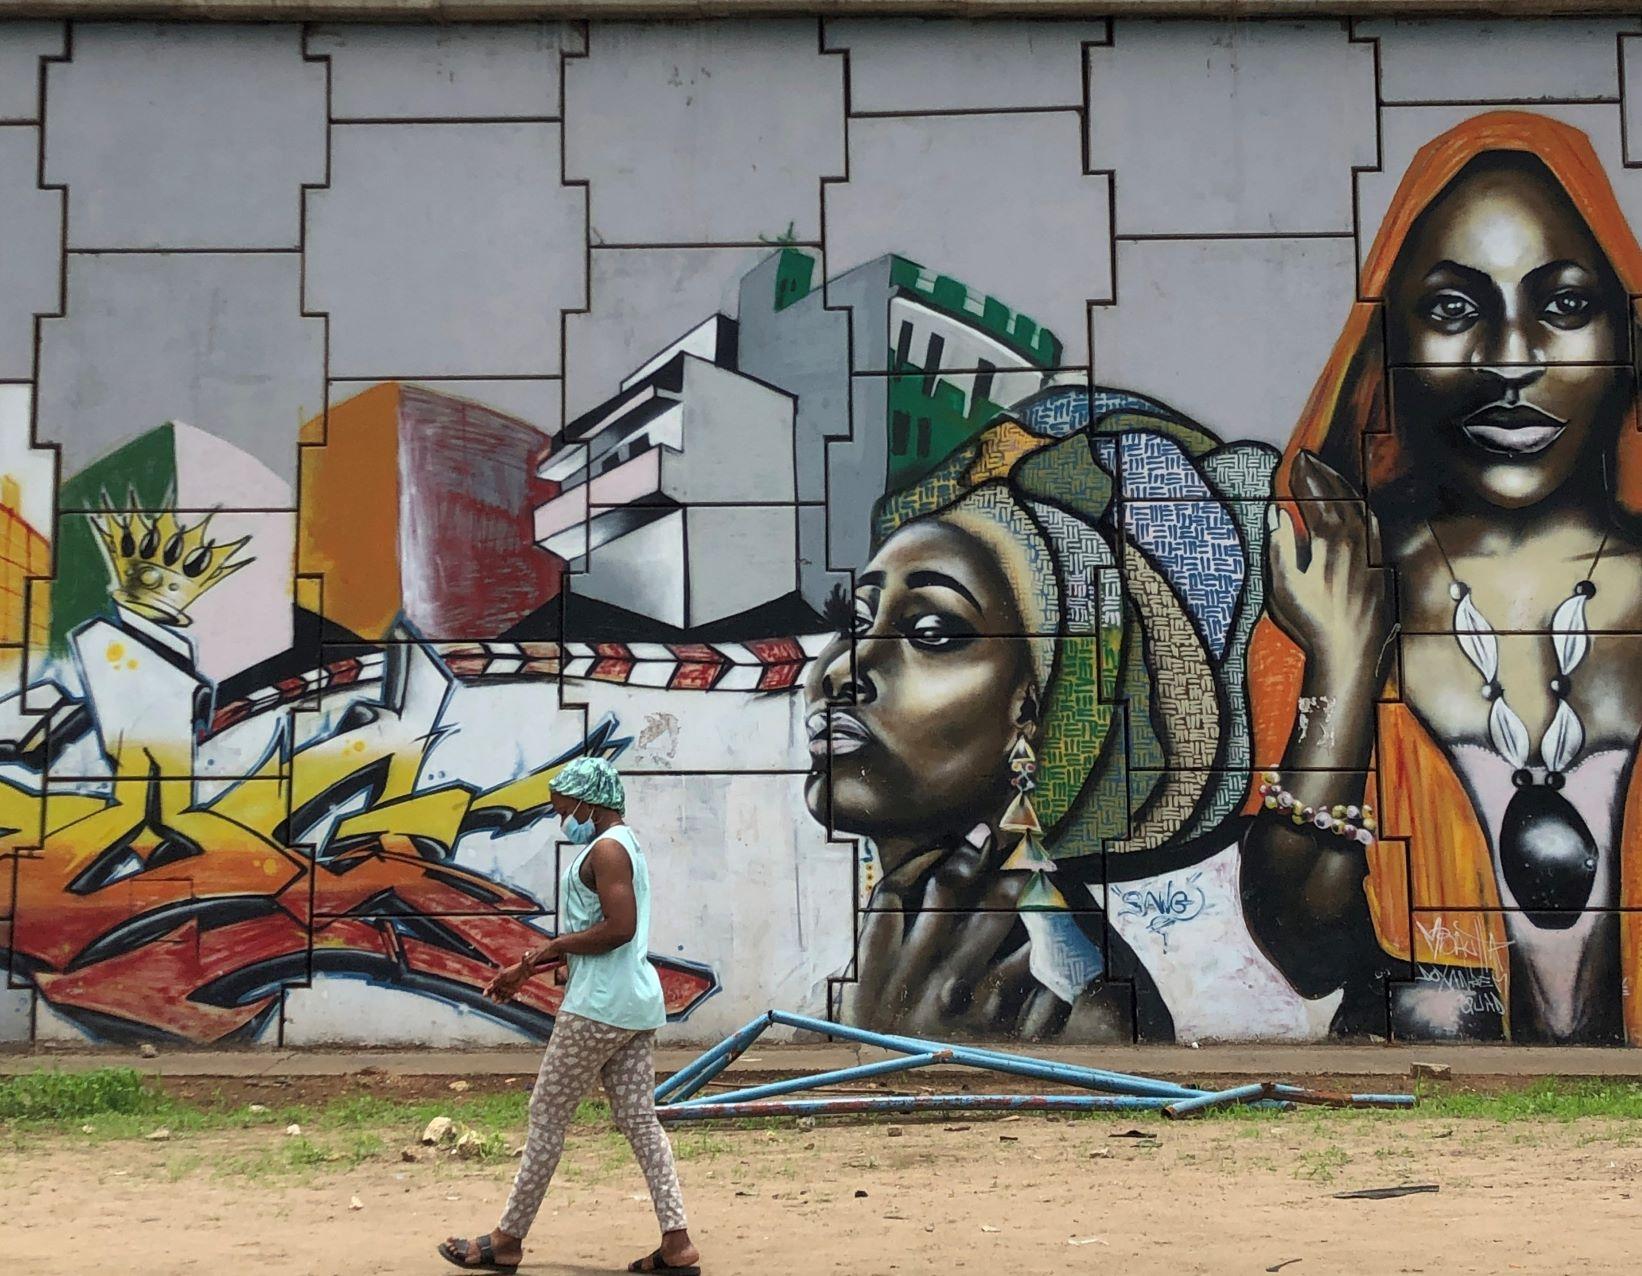 Female entrepreneurs challenge social norms in Senegal